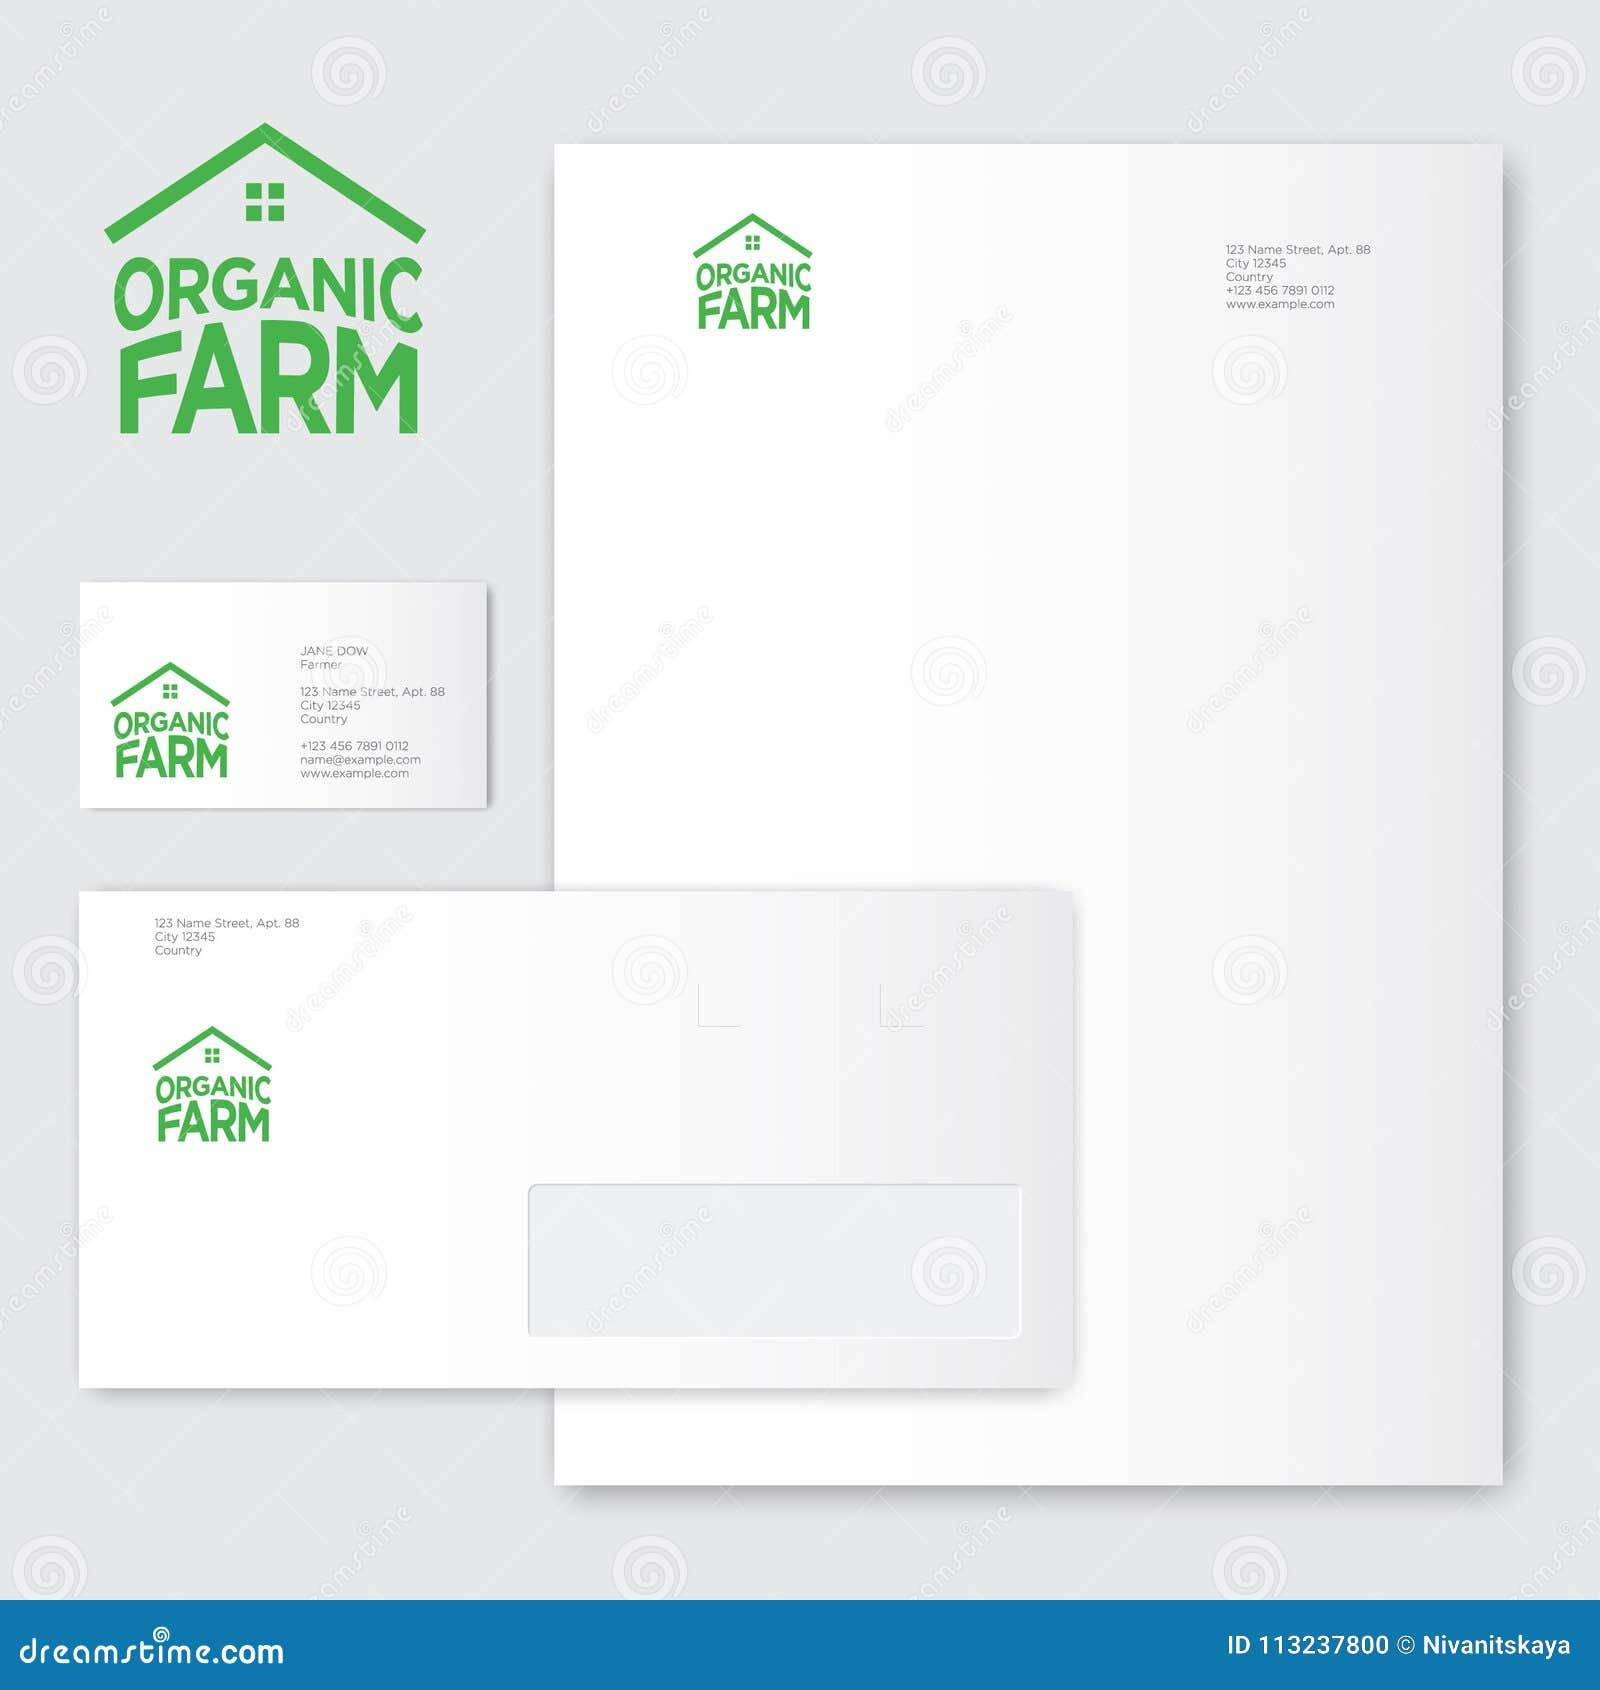 organic farm logo organic food emblems green letters as house